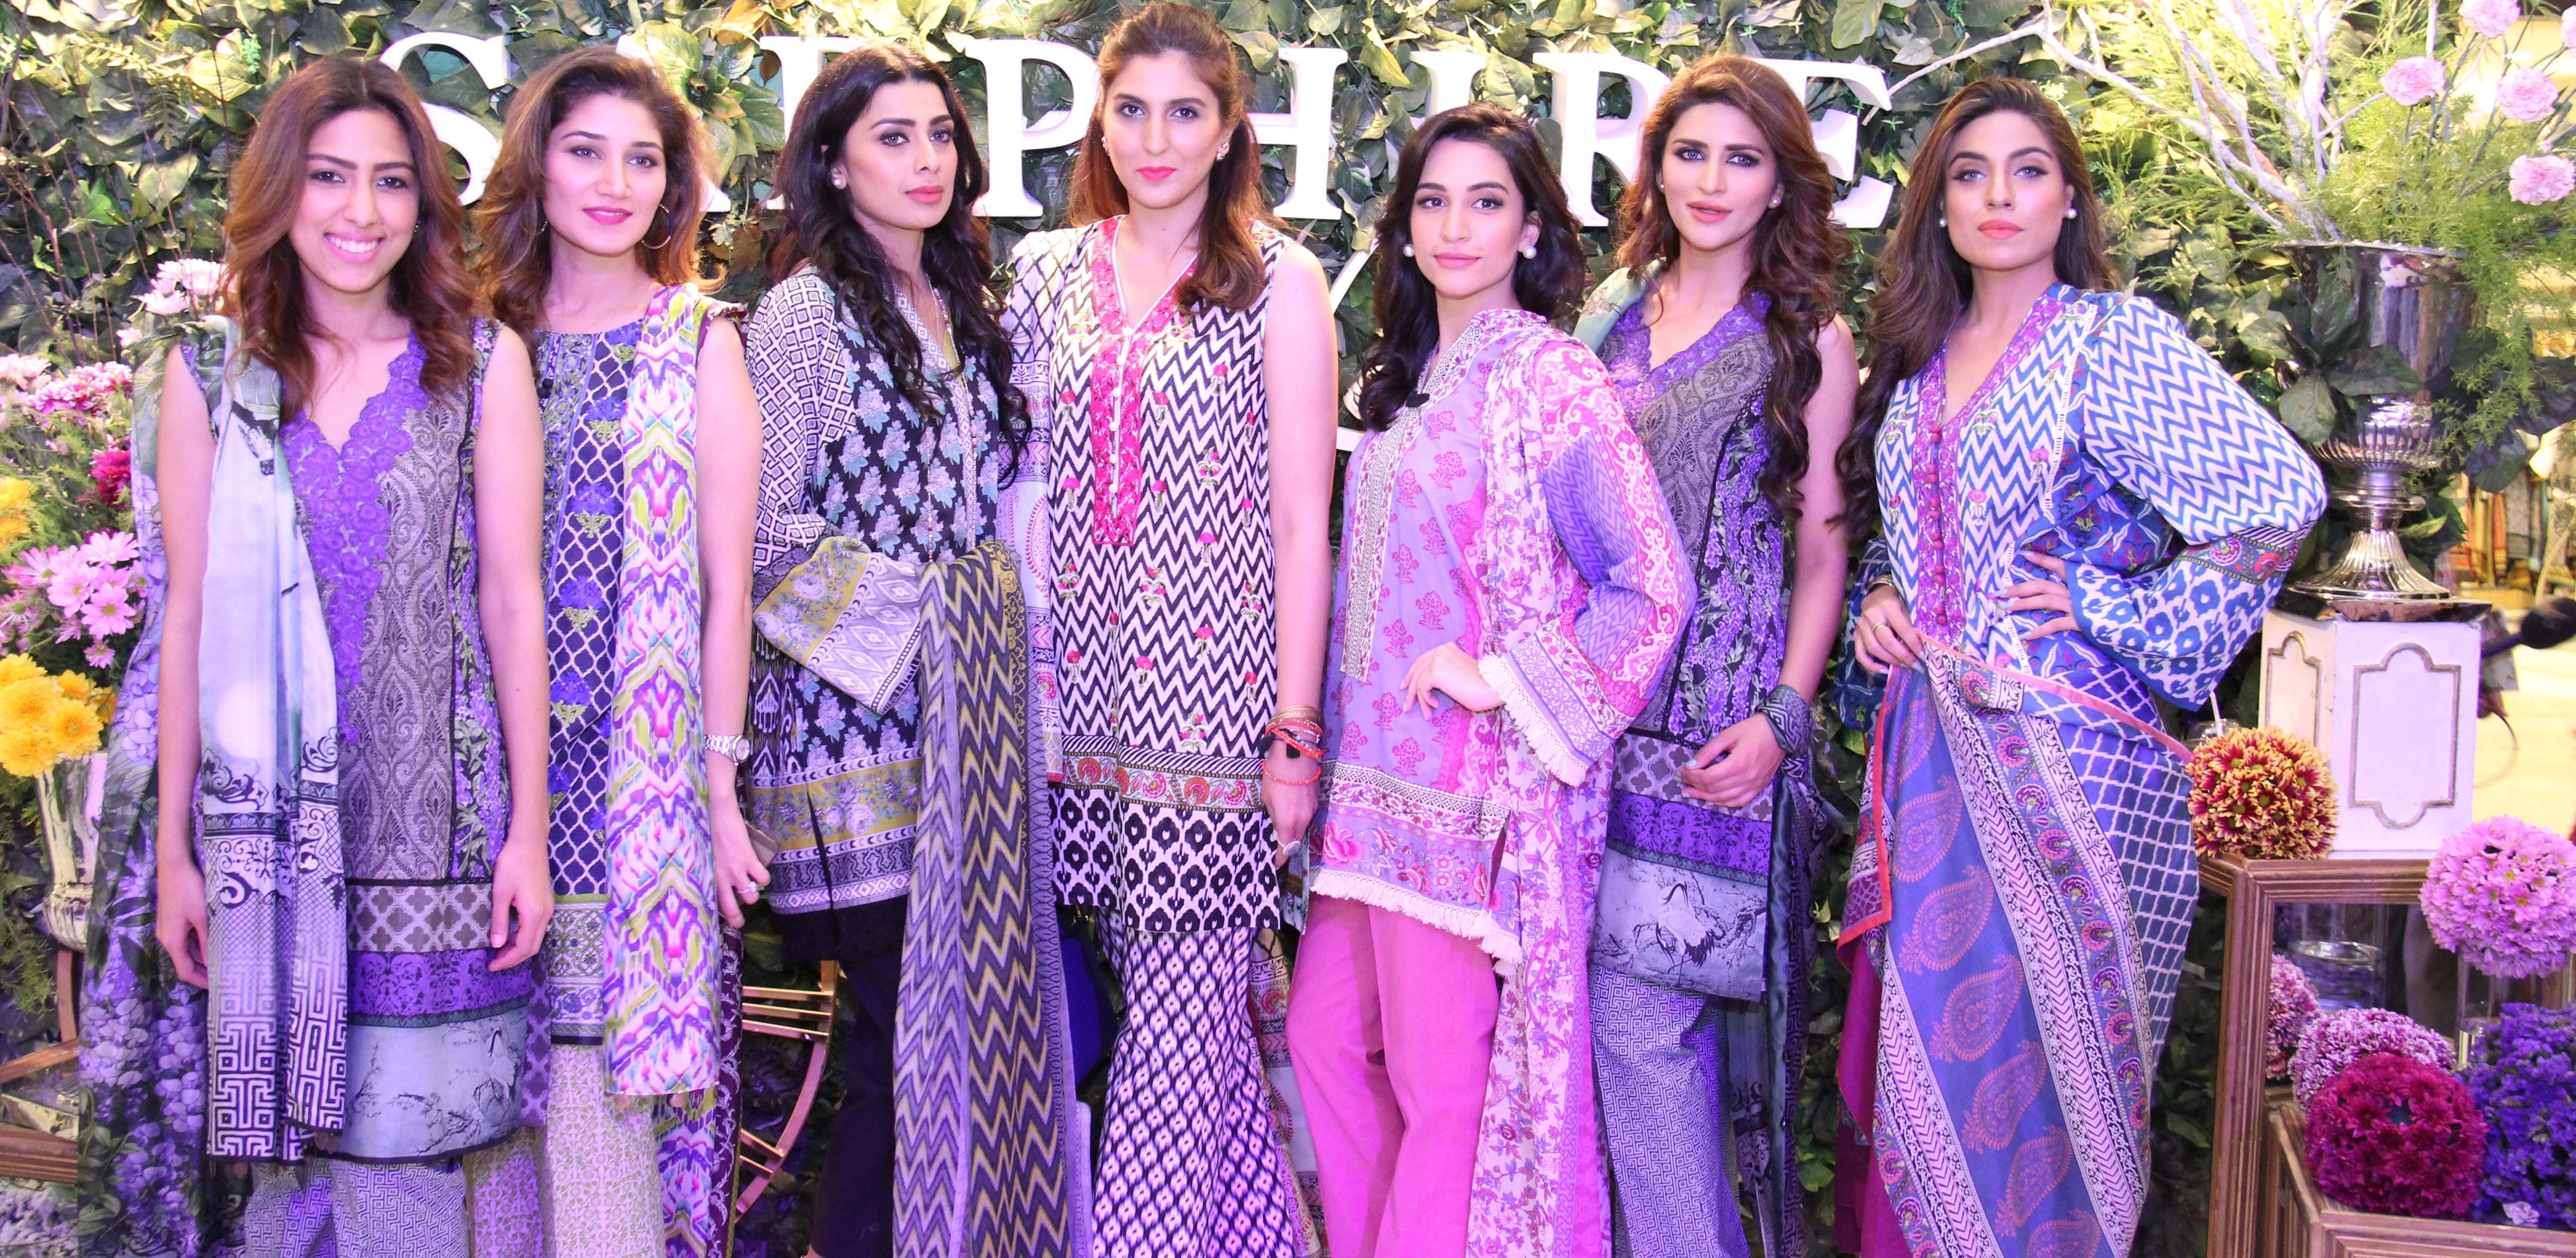 Natasha, Meher Bano, Fia, Khadijah, Sana, Falak and Ekra